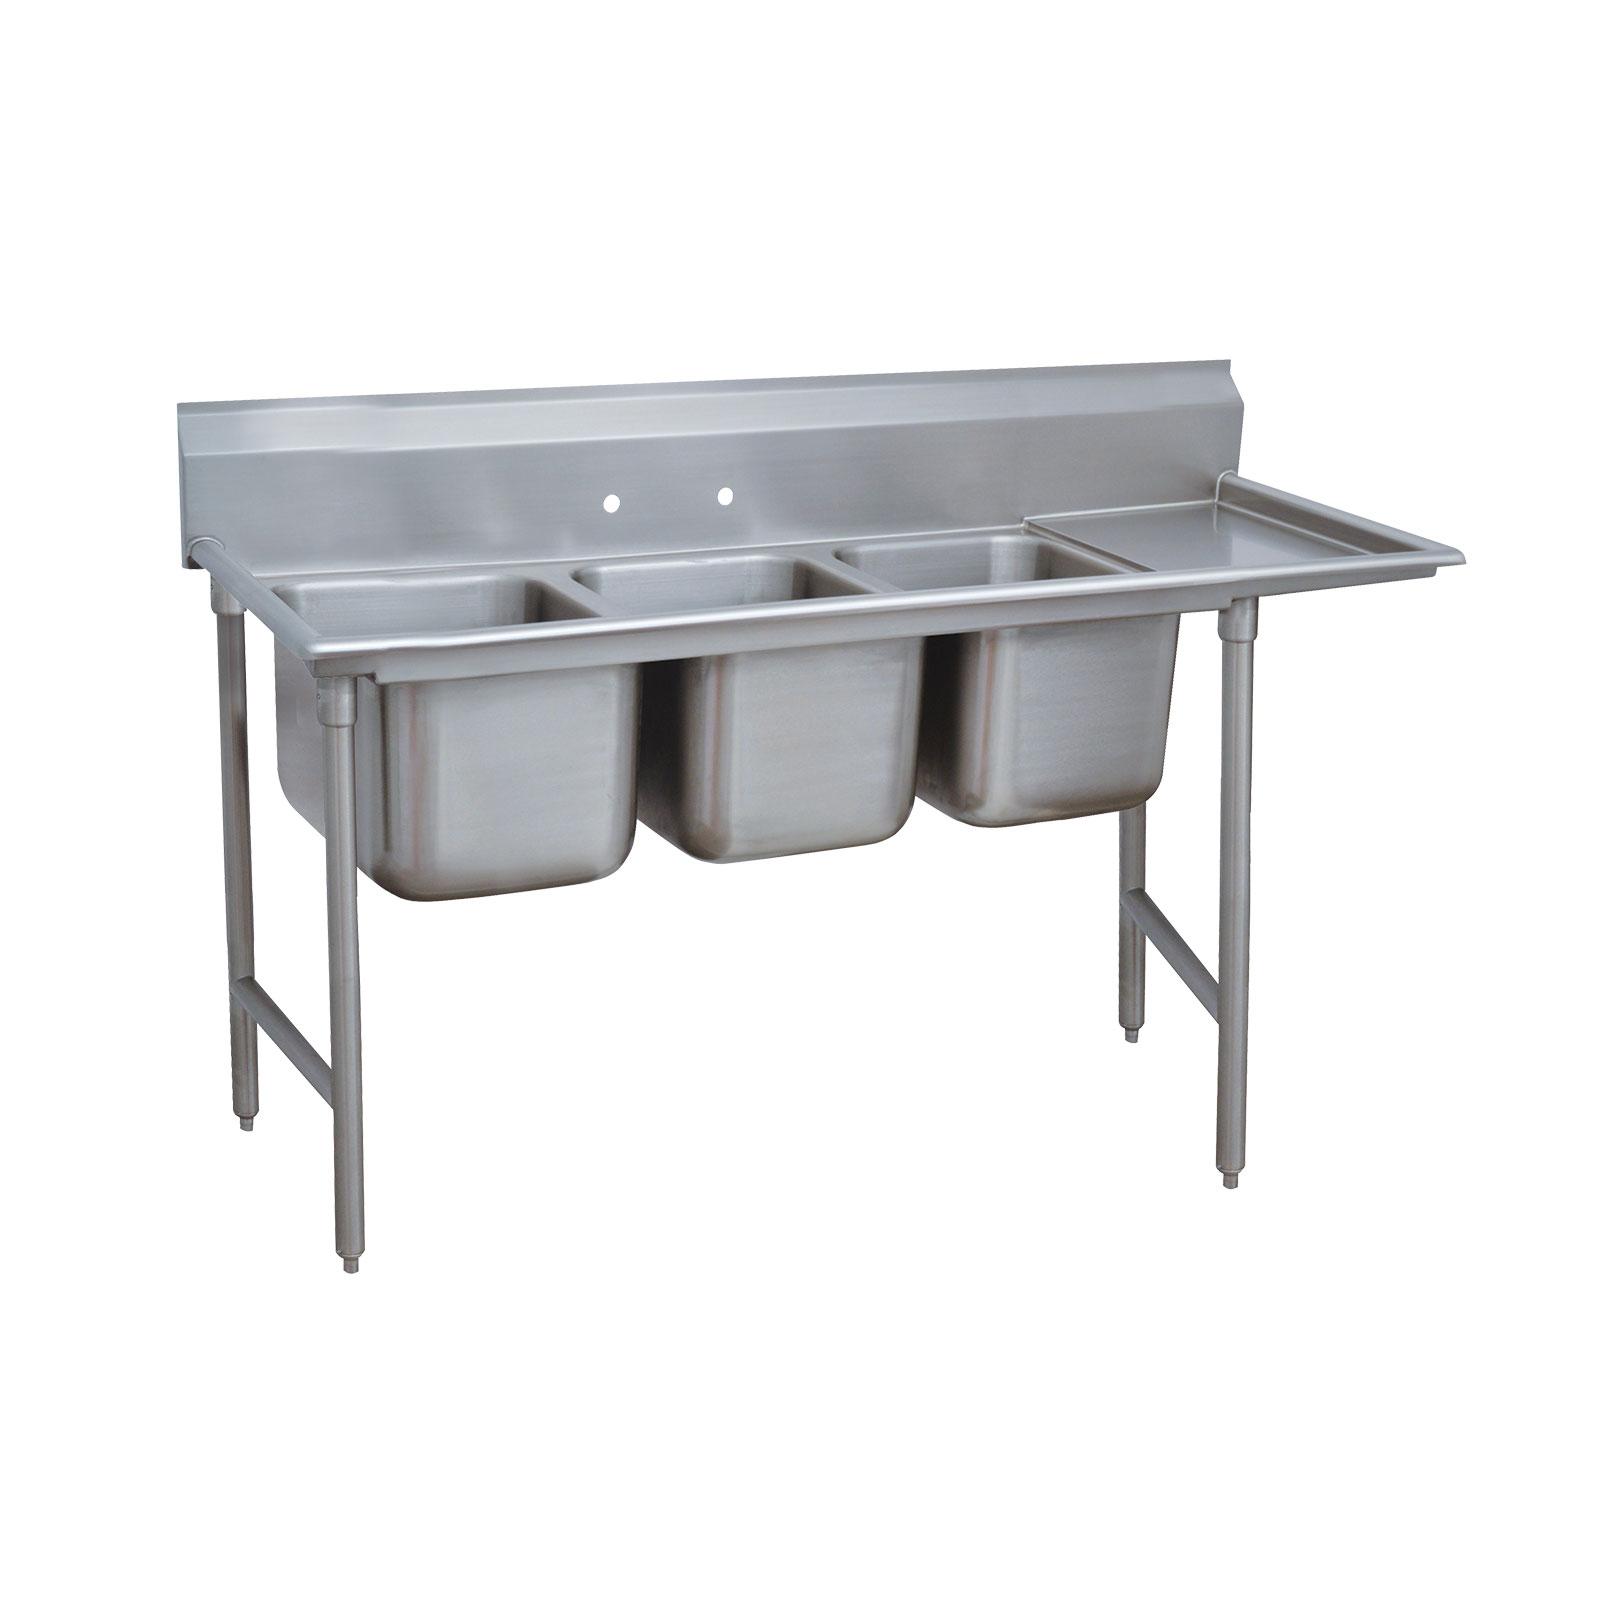 Advance Tabco 9-3-54-36R sink, (3) three compartment